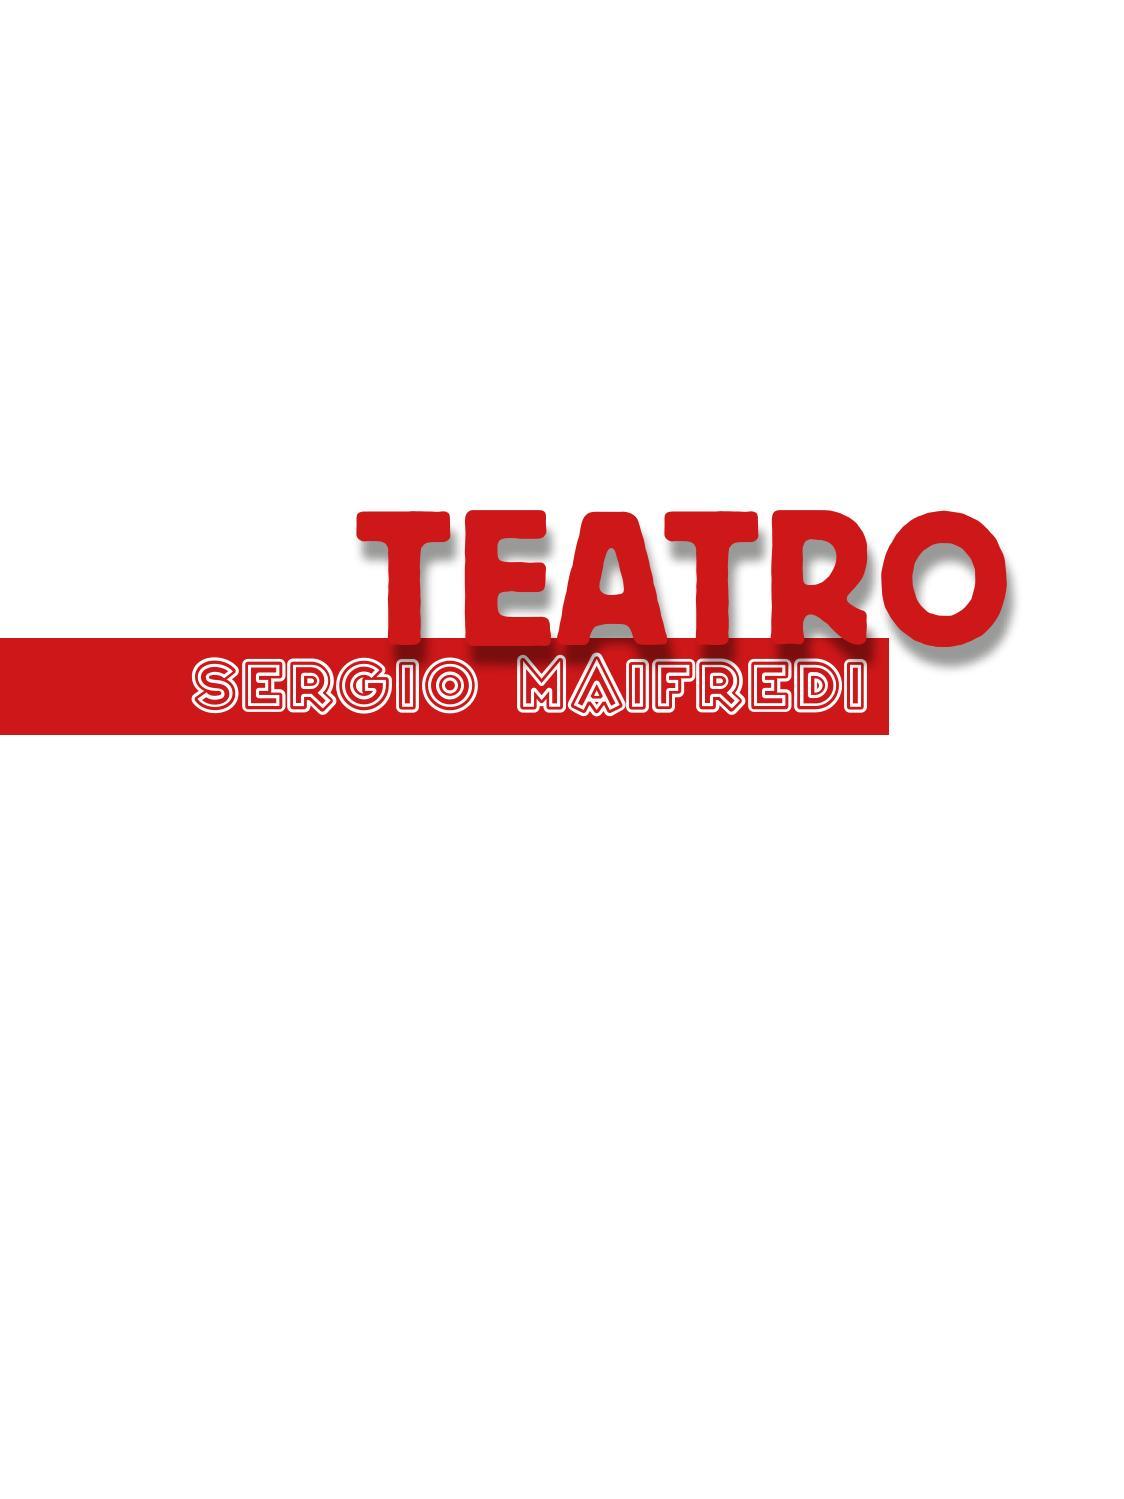 Teatro Sergio Maifredi By Sergiomaifredi Issuu